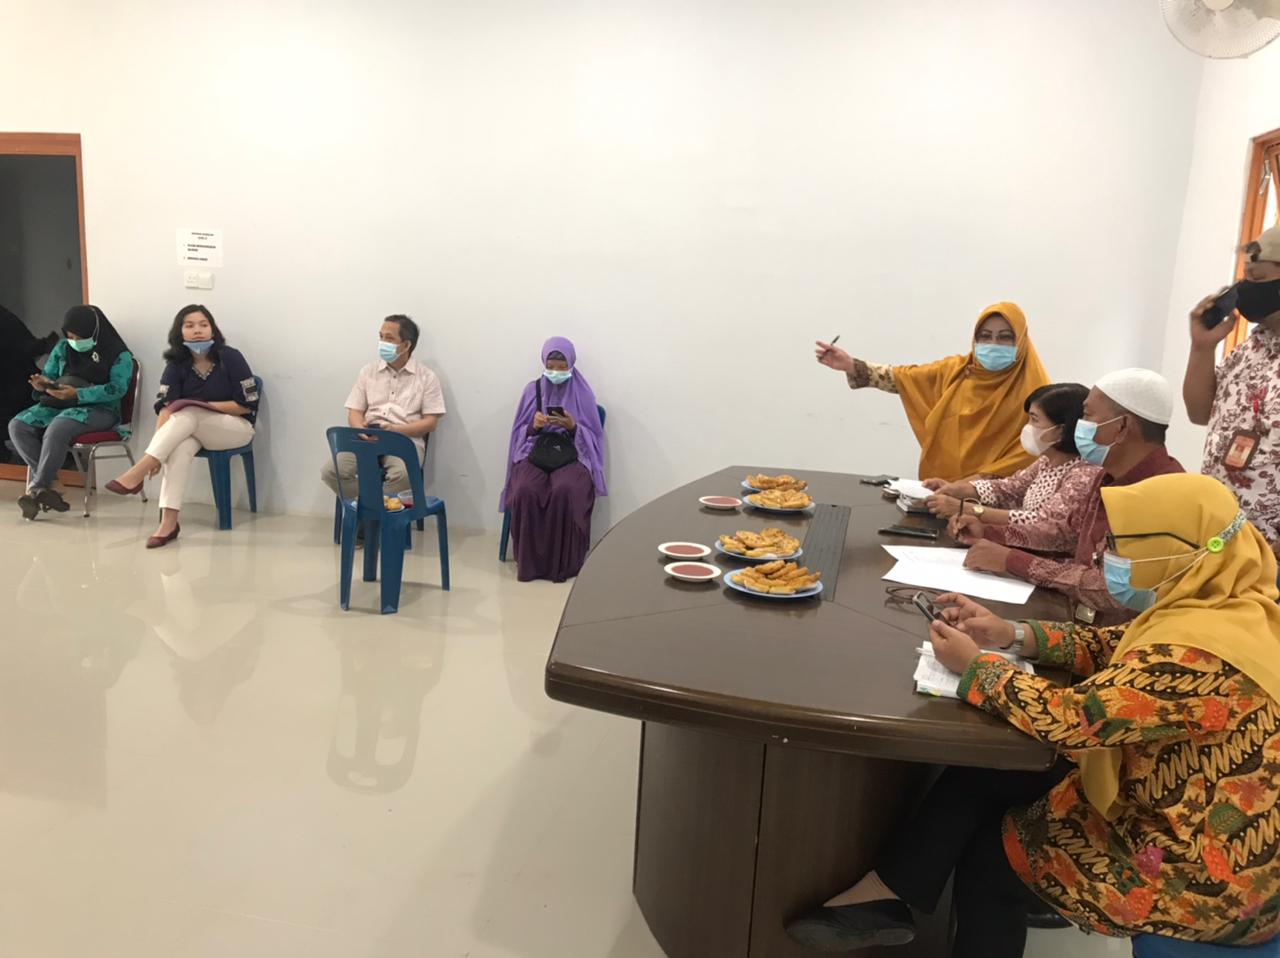 Rapat bersama kelompok binaan Dinas Perikanan terkait rencana keikutsertaan dalam Bazar Wonderfood Ramadhan 2021.